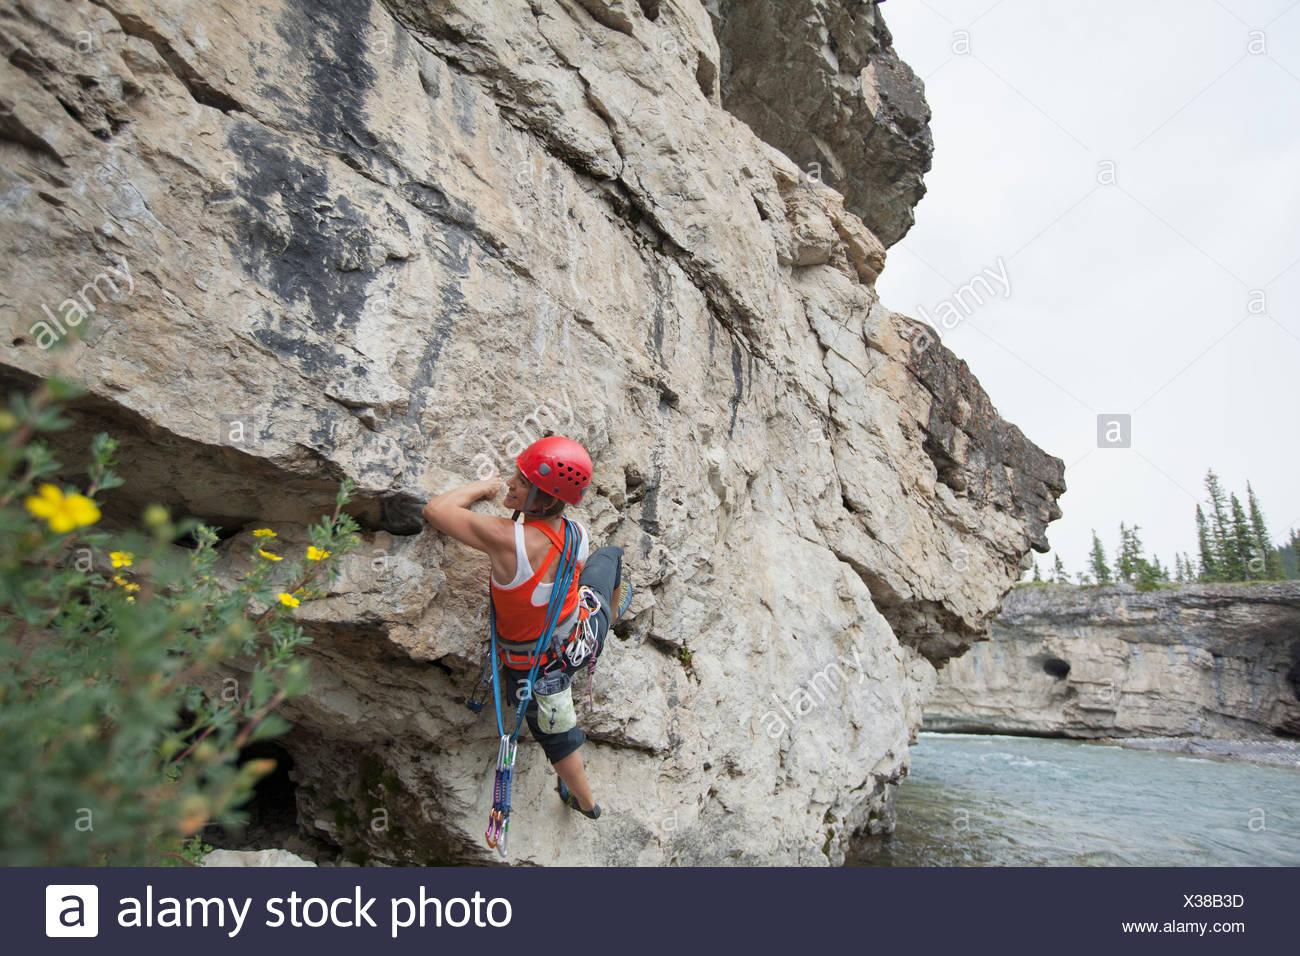 female rock climber scaling rock face - Stock Image